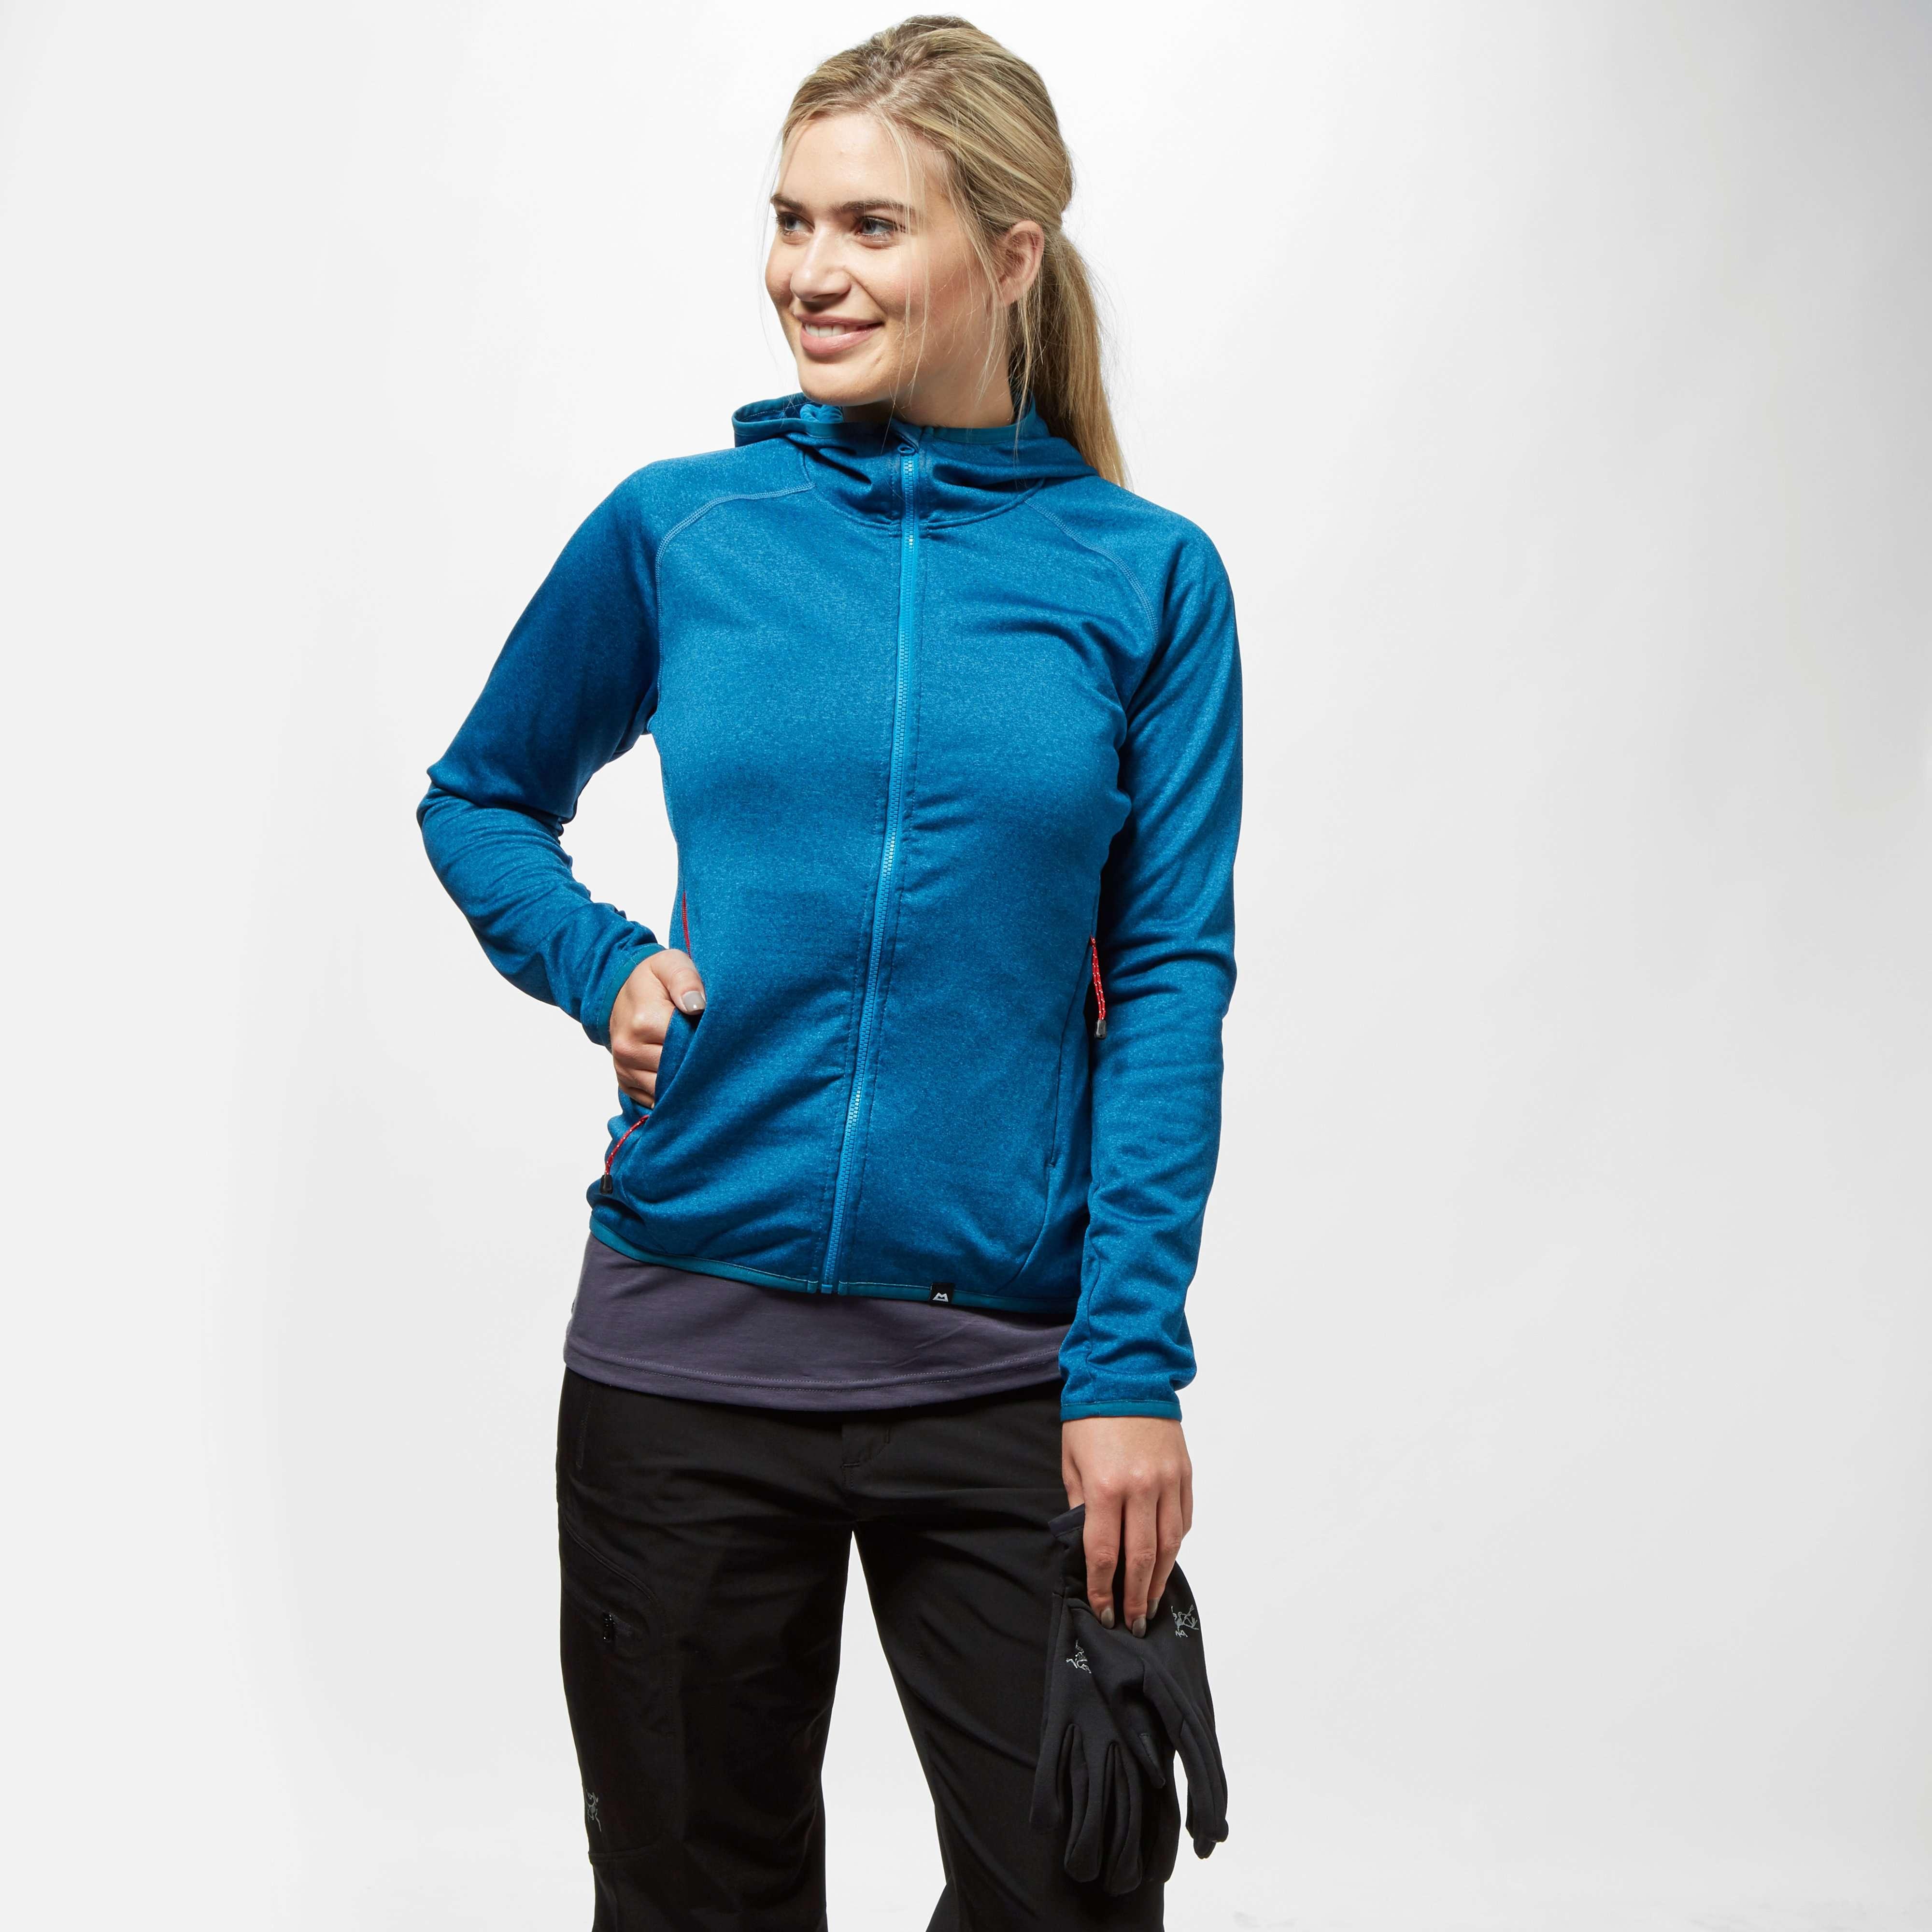 MOUNTAIN EQUIPMENT Women's Beehive Jacket